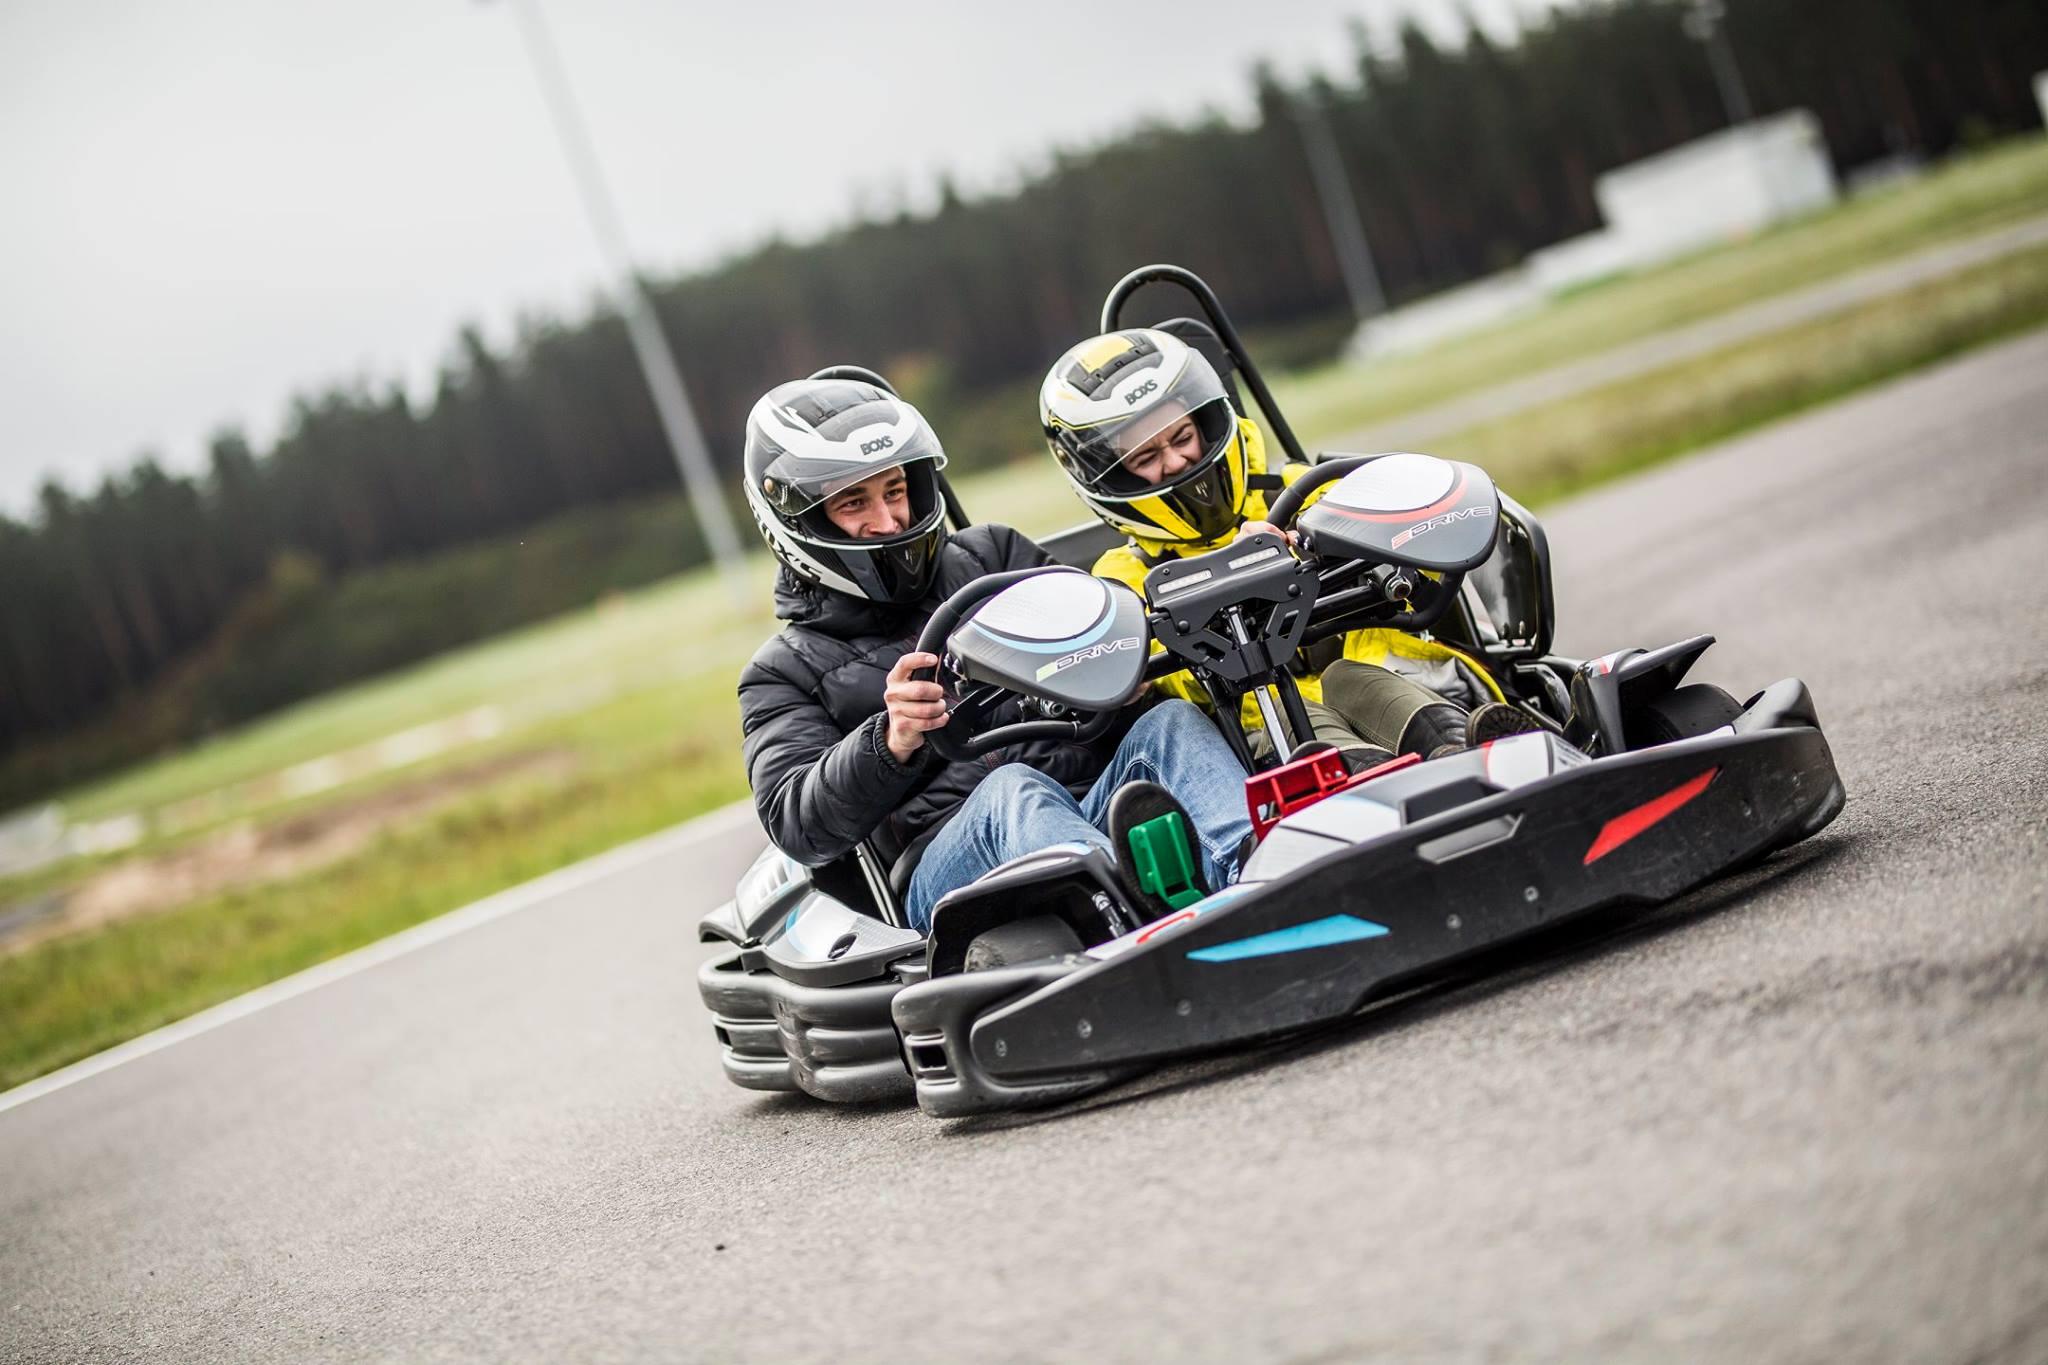 kart over riga Racing outdoors   go karting in Riga, Latvia   Allure Tours.lv kart over riga